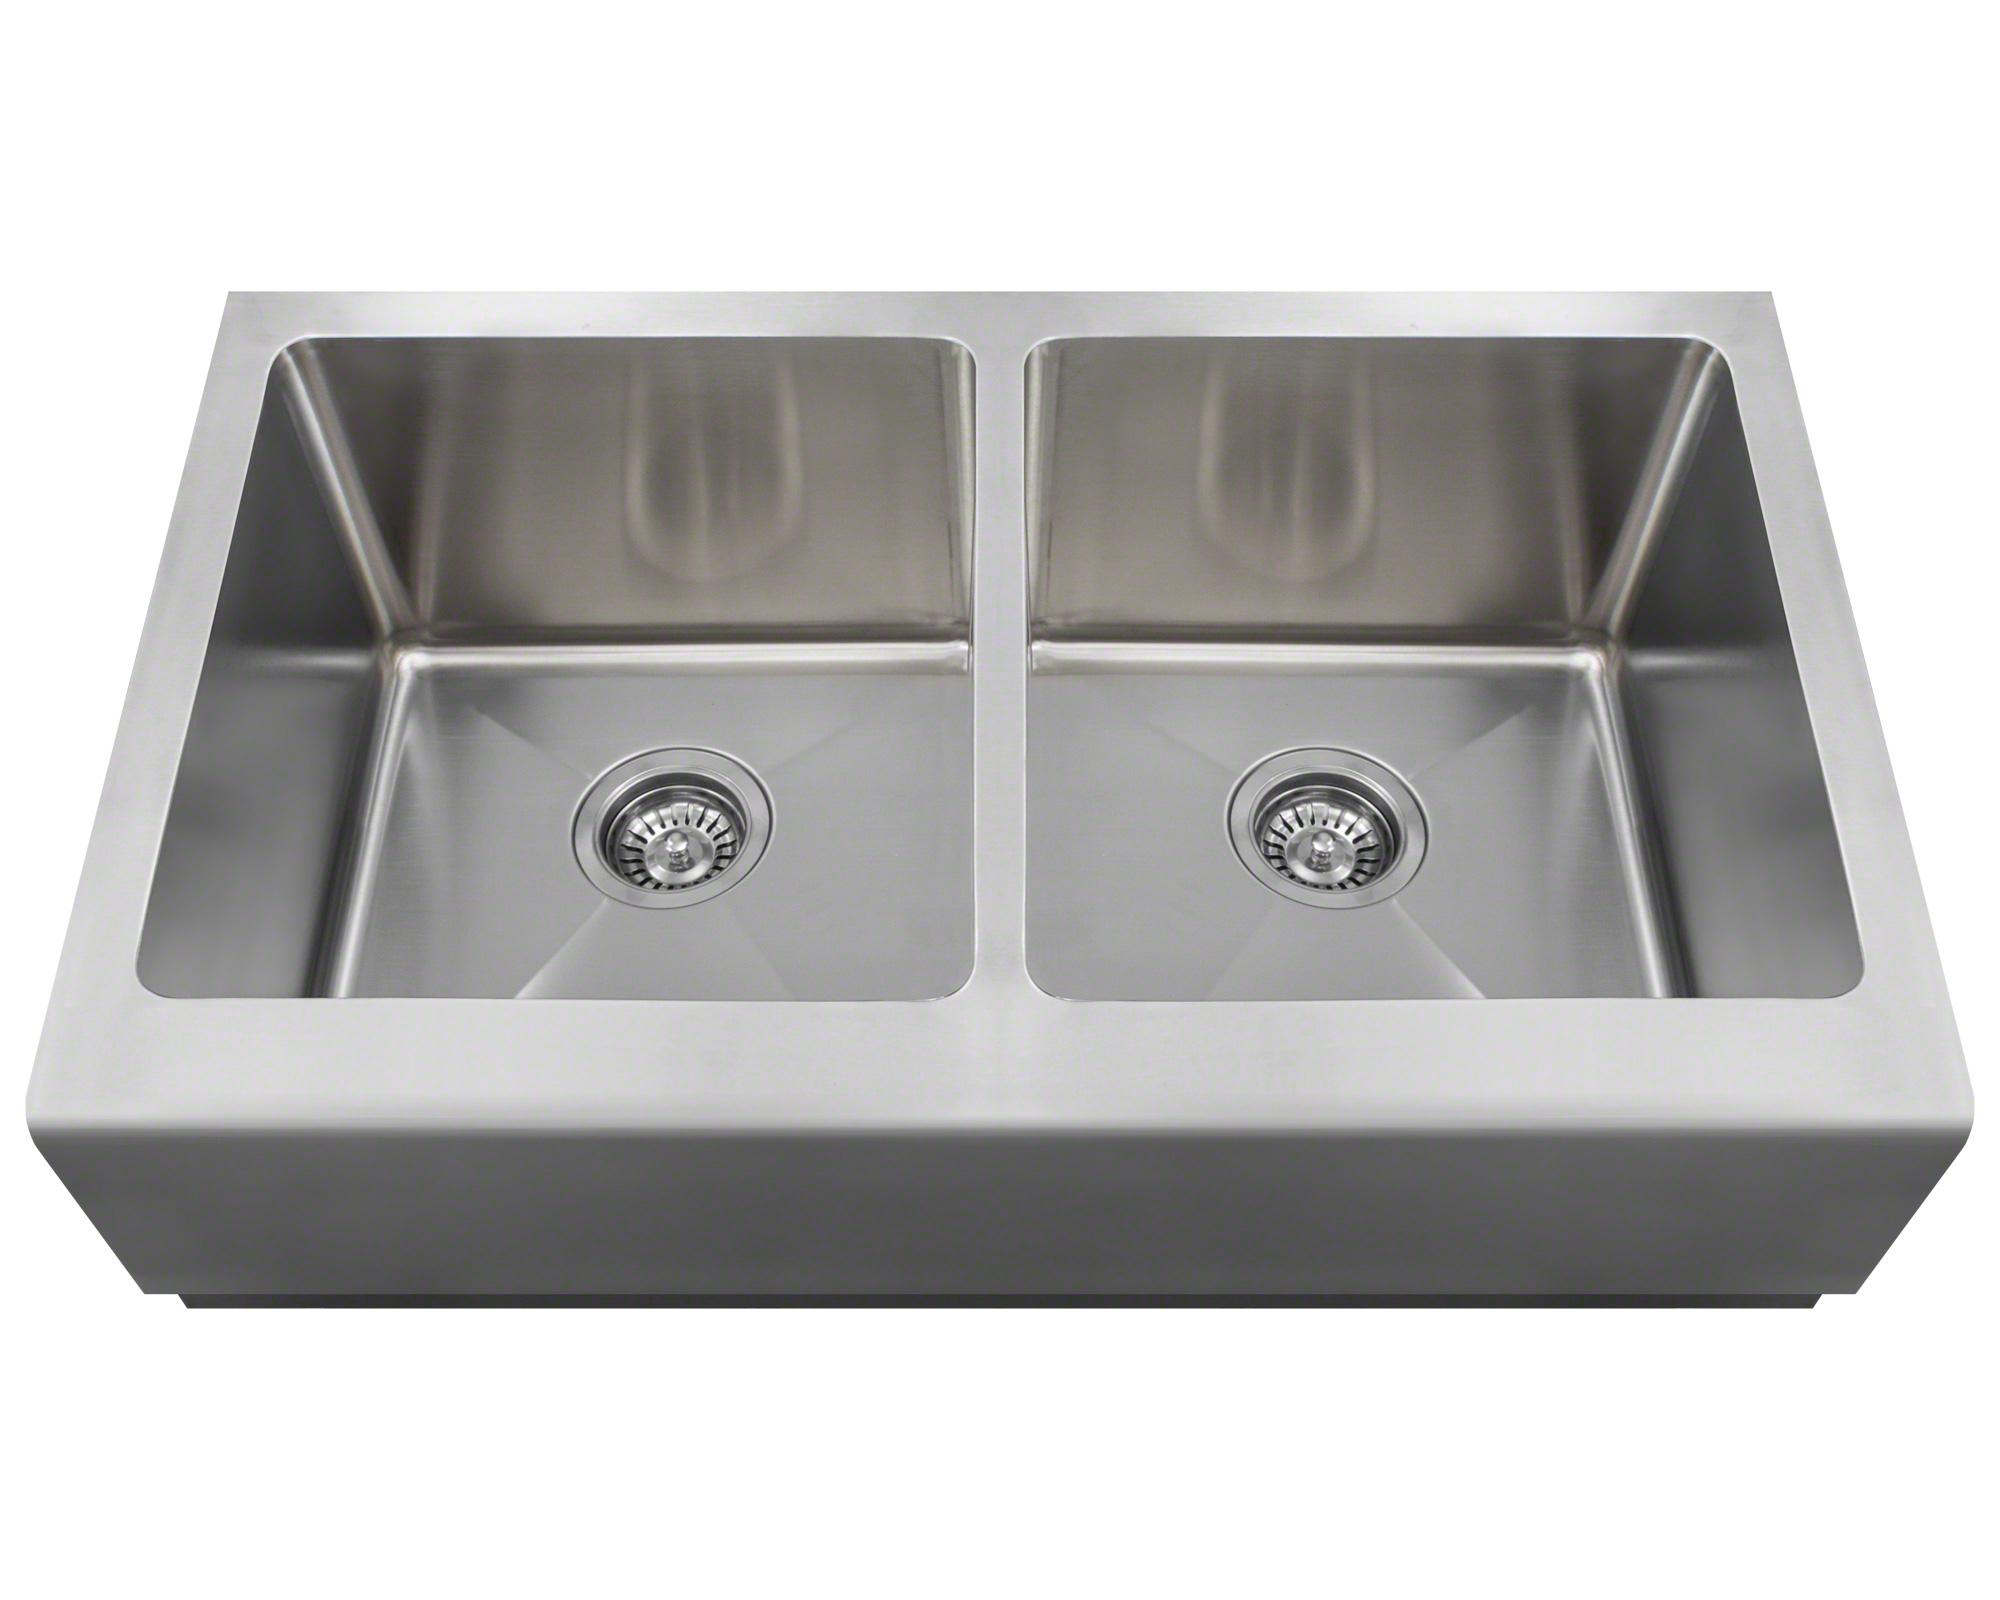 Polaris P604 Double Equal Bowl Apron Sink